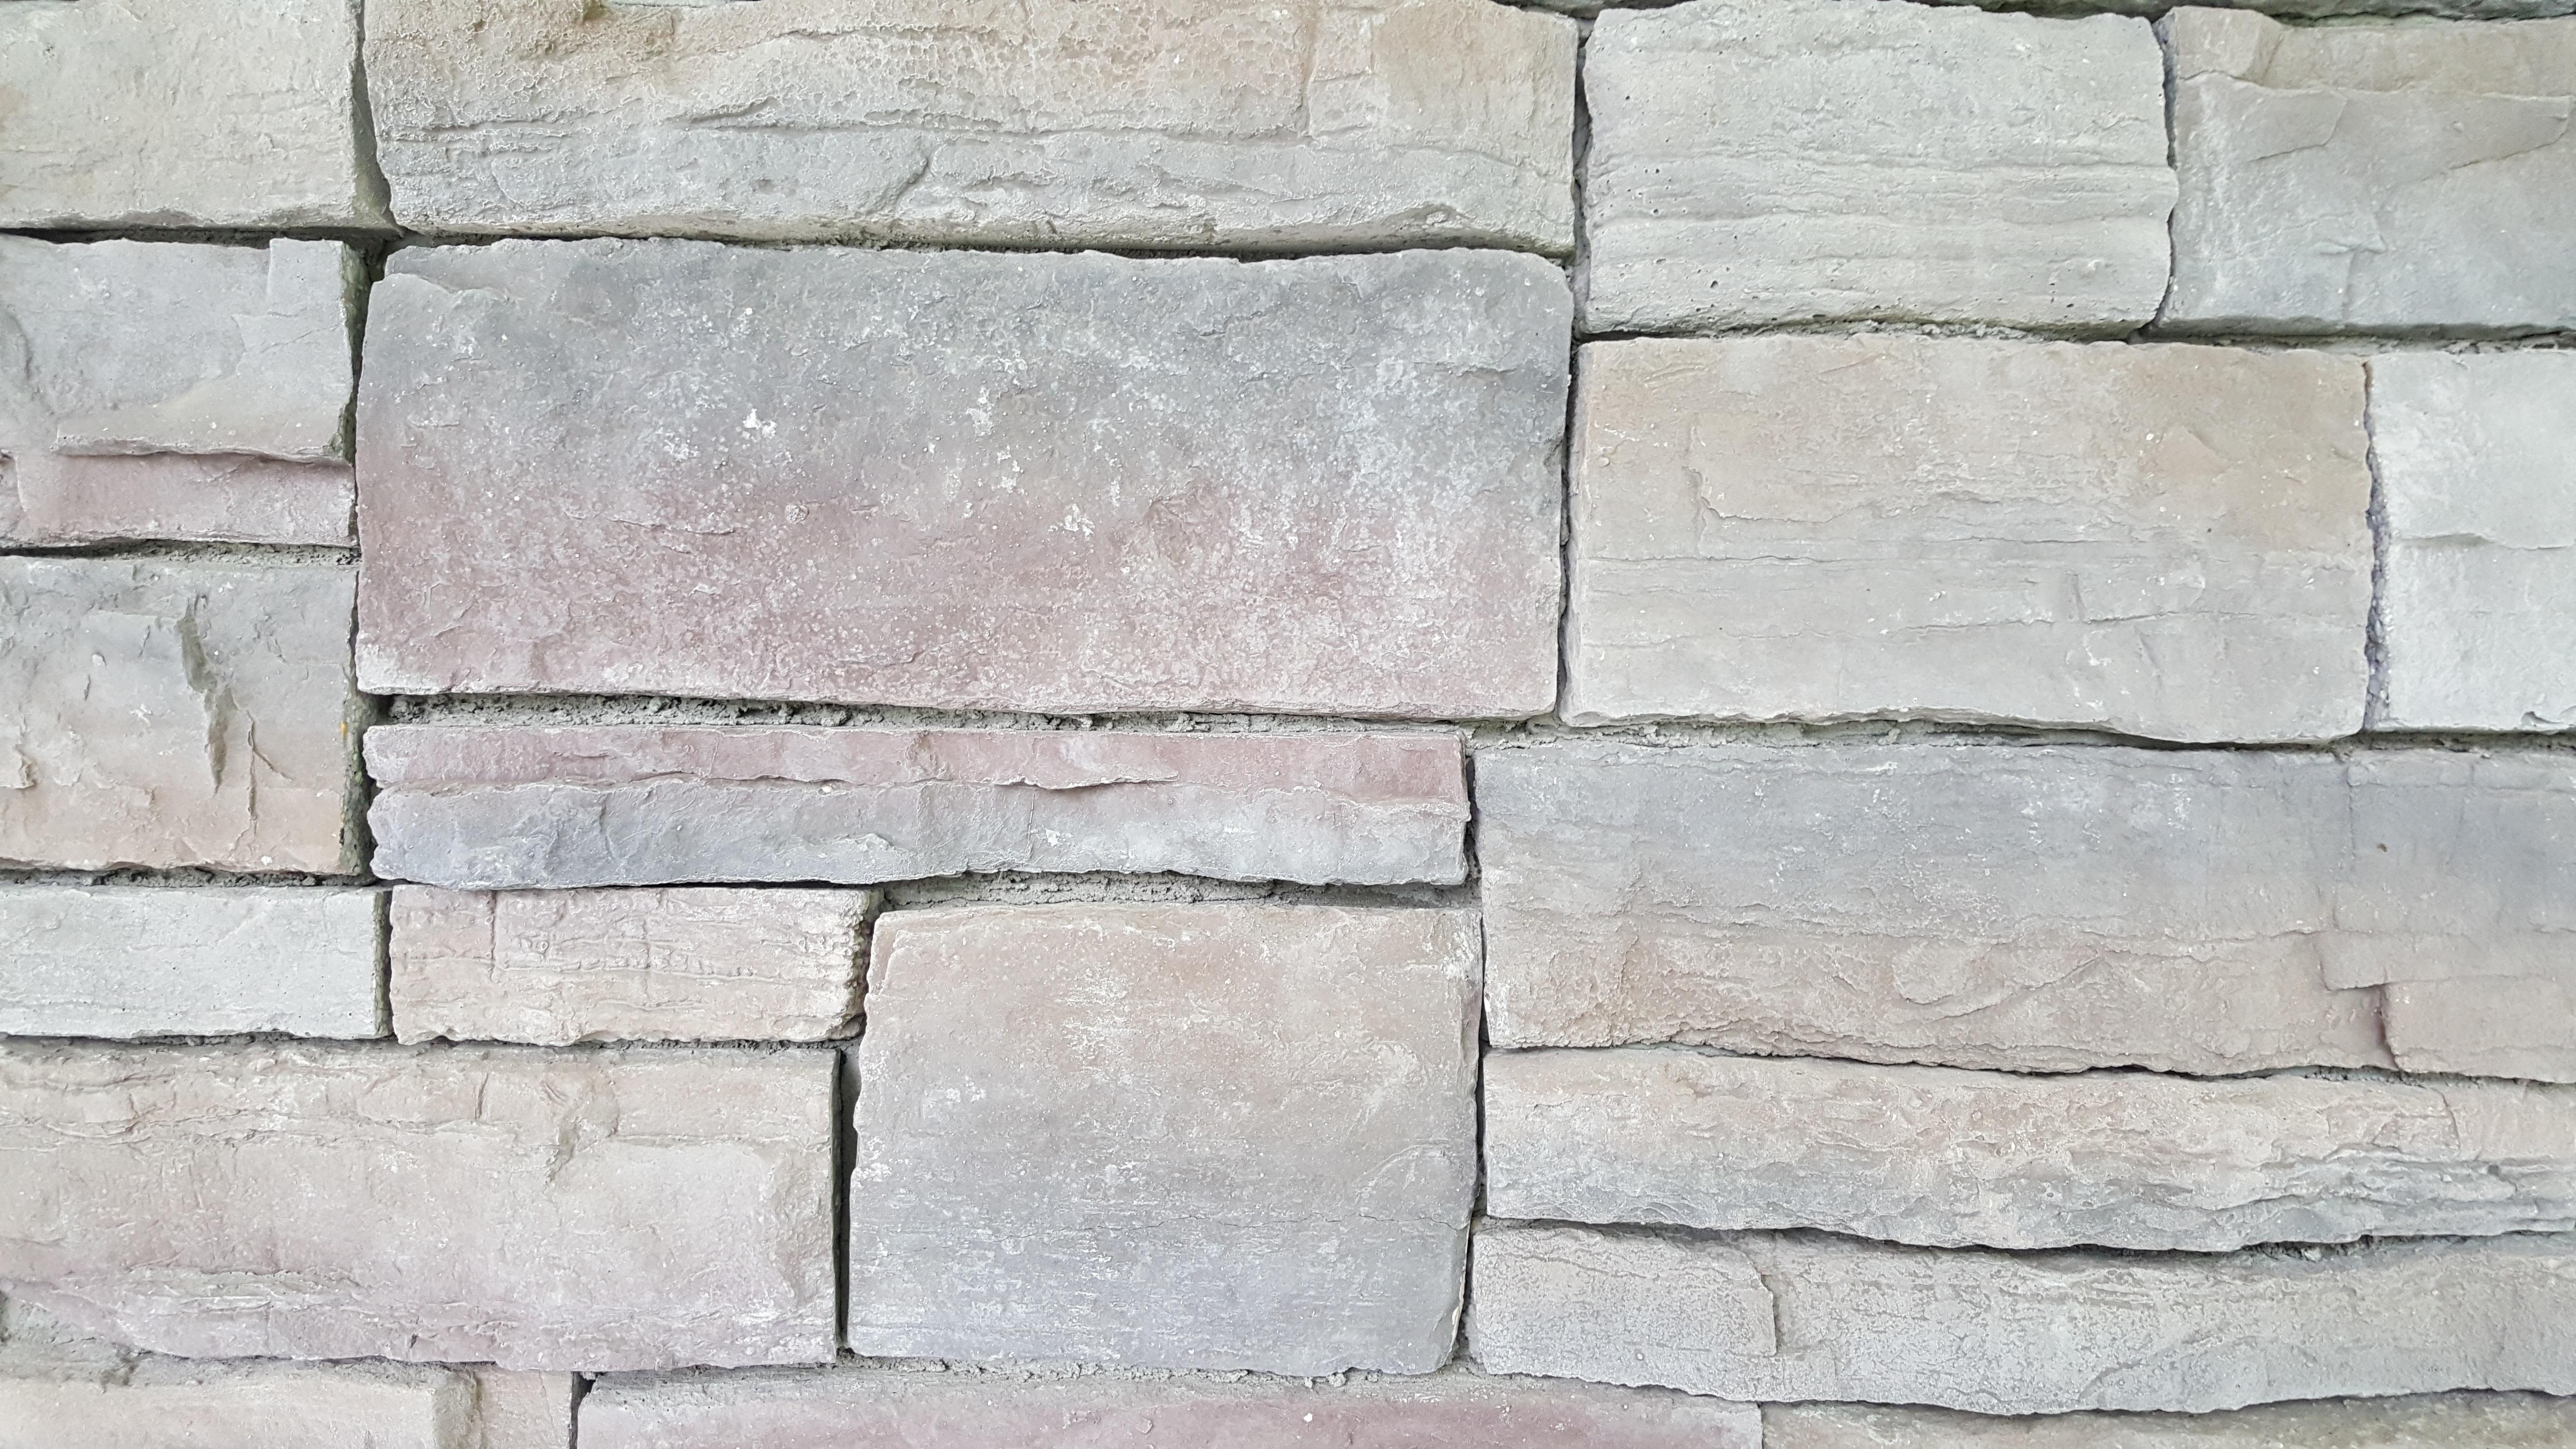 Piastrelle muro elegant mattonelle da parete with piastrelle muro great piastrelle da per - Piastrelle muro pietra ...